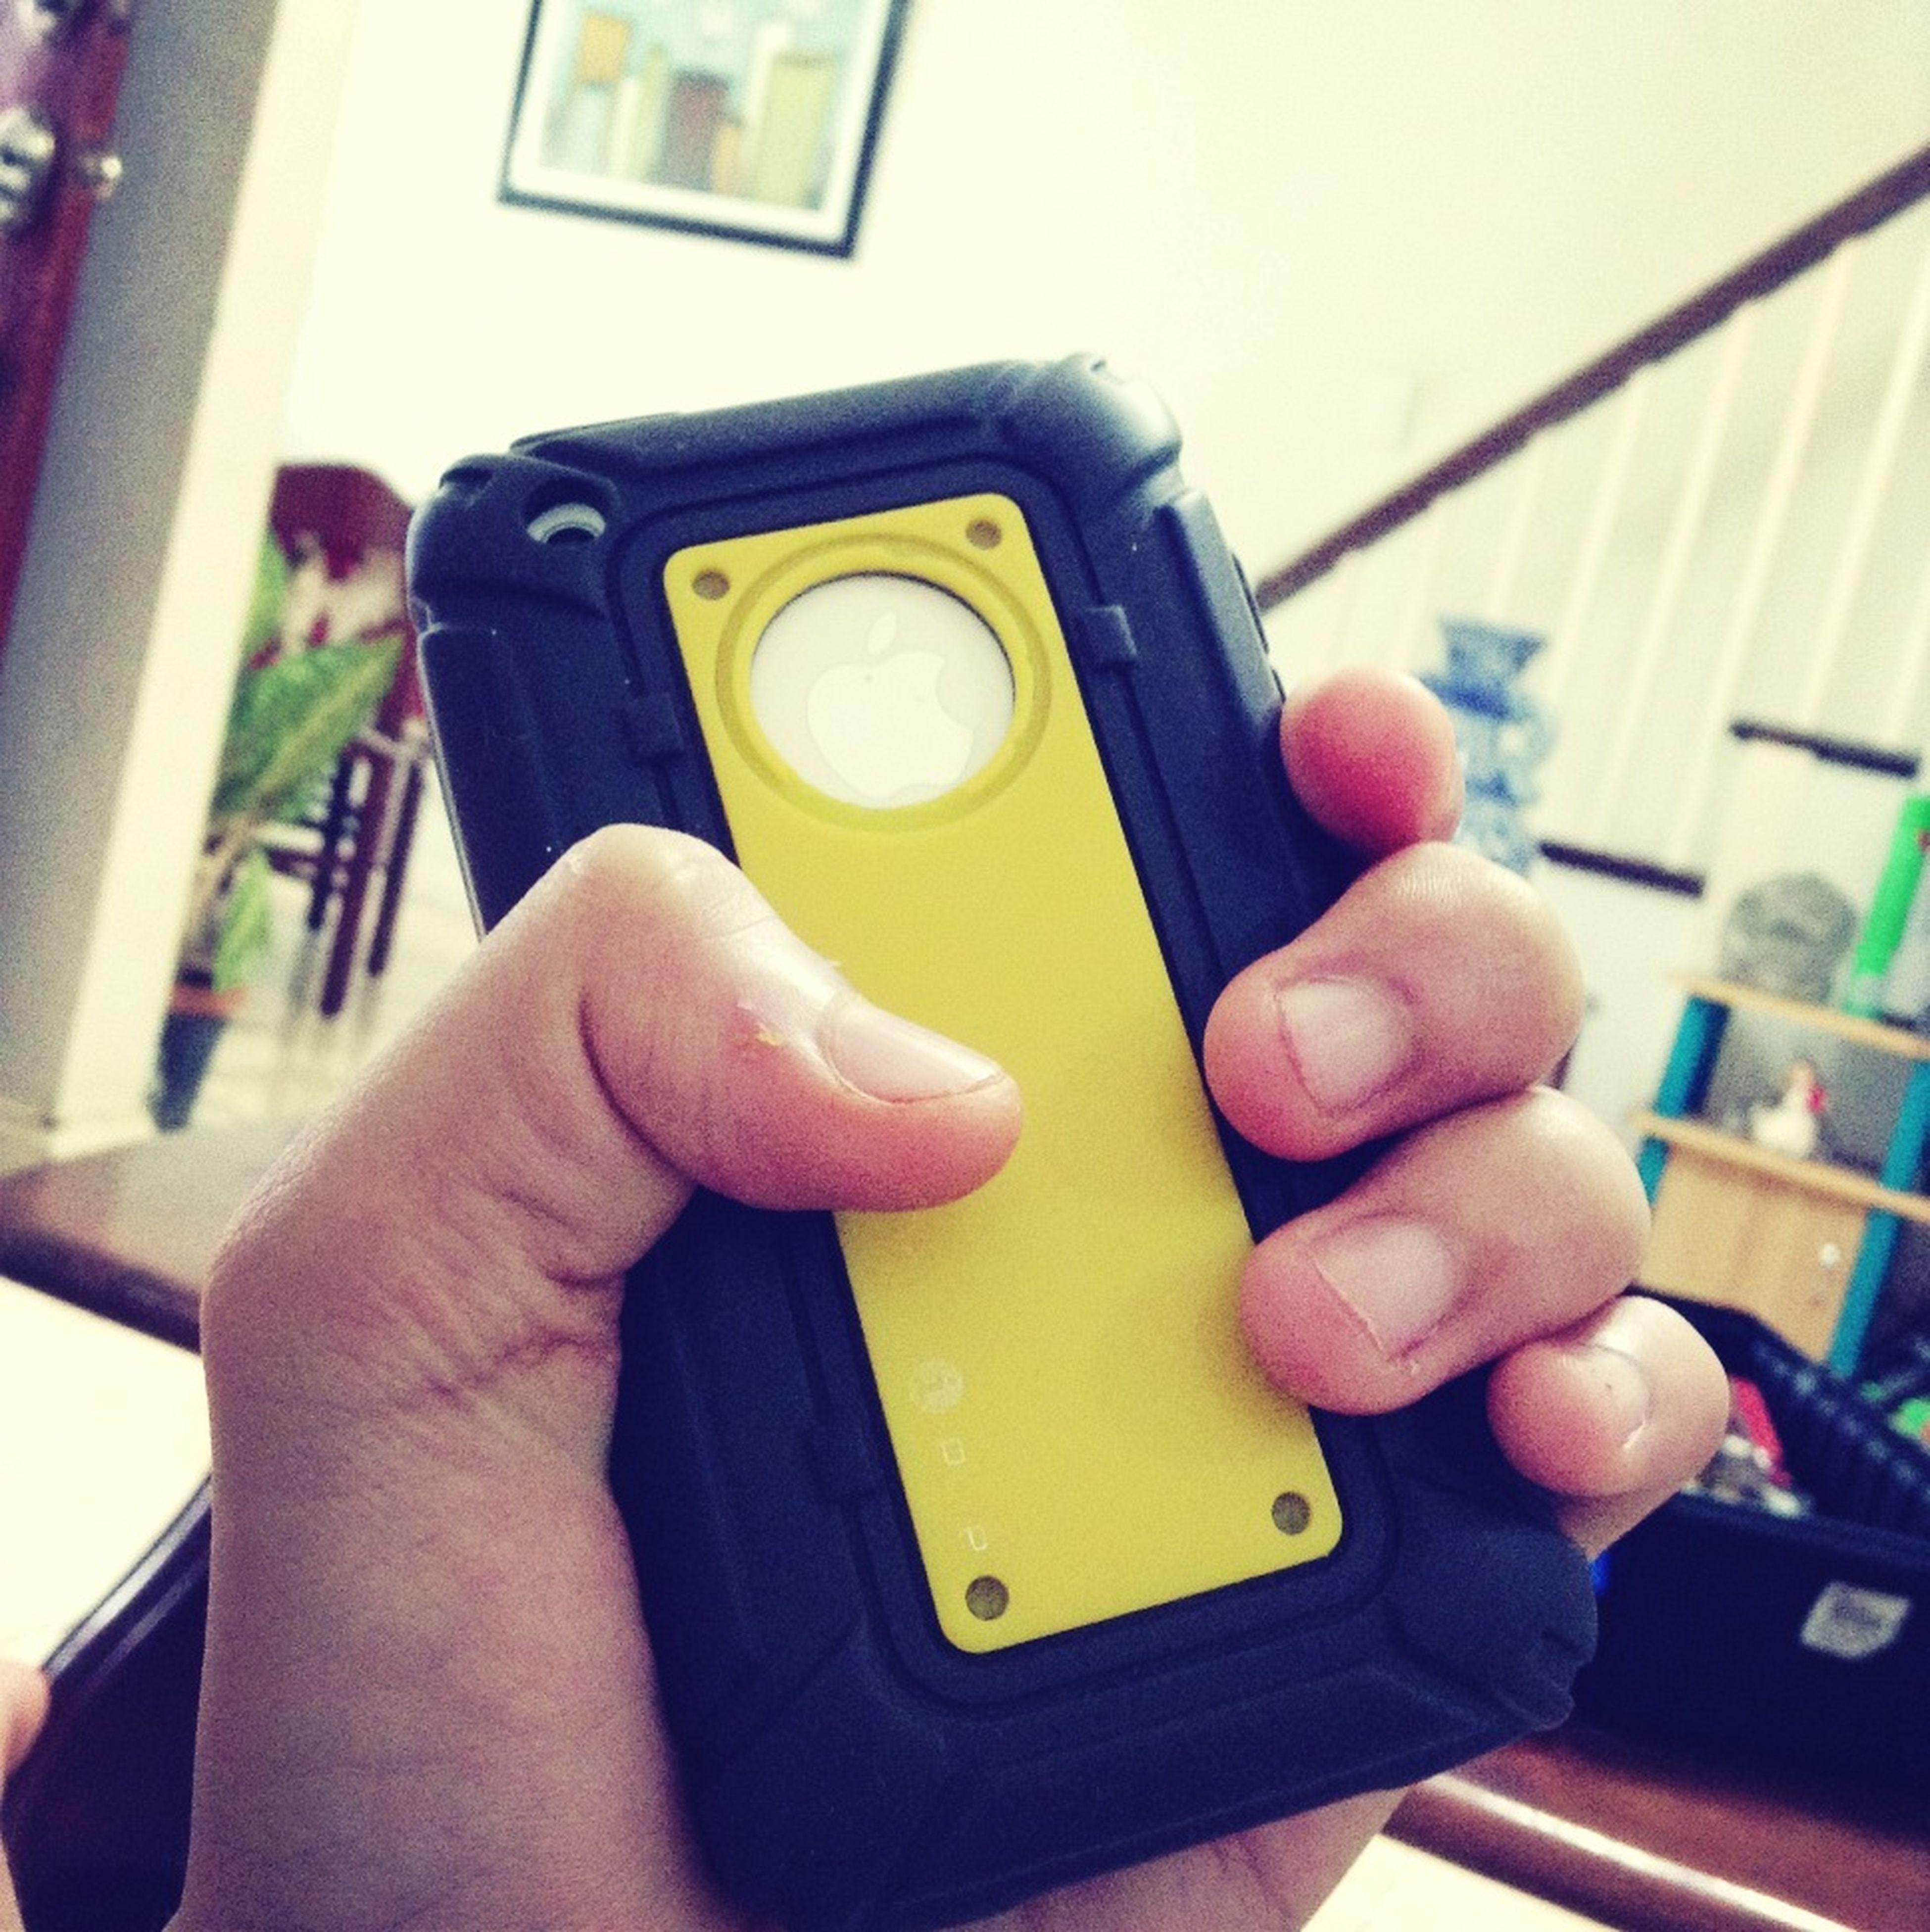 Still Alive: Iphone 3g